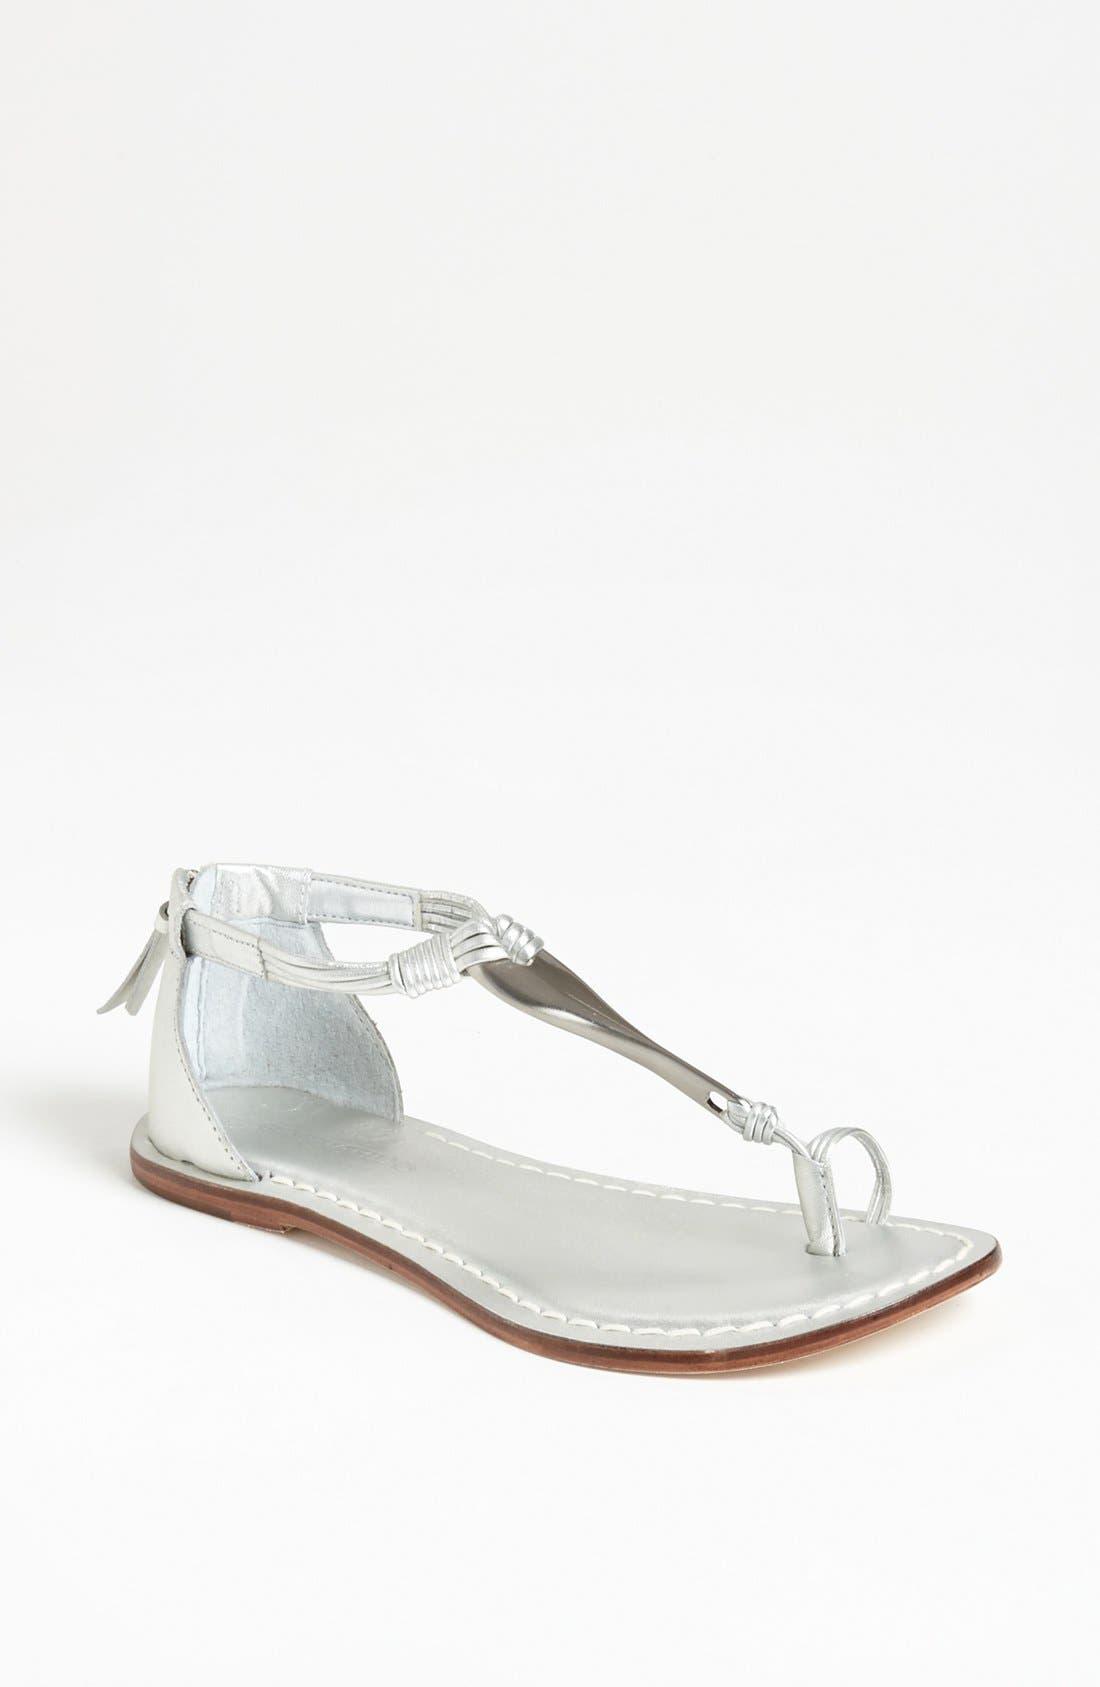 Alternate Image 1 Selected - Bernardo Footwear Marina Sandal